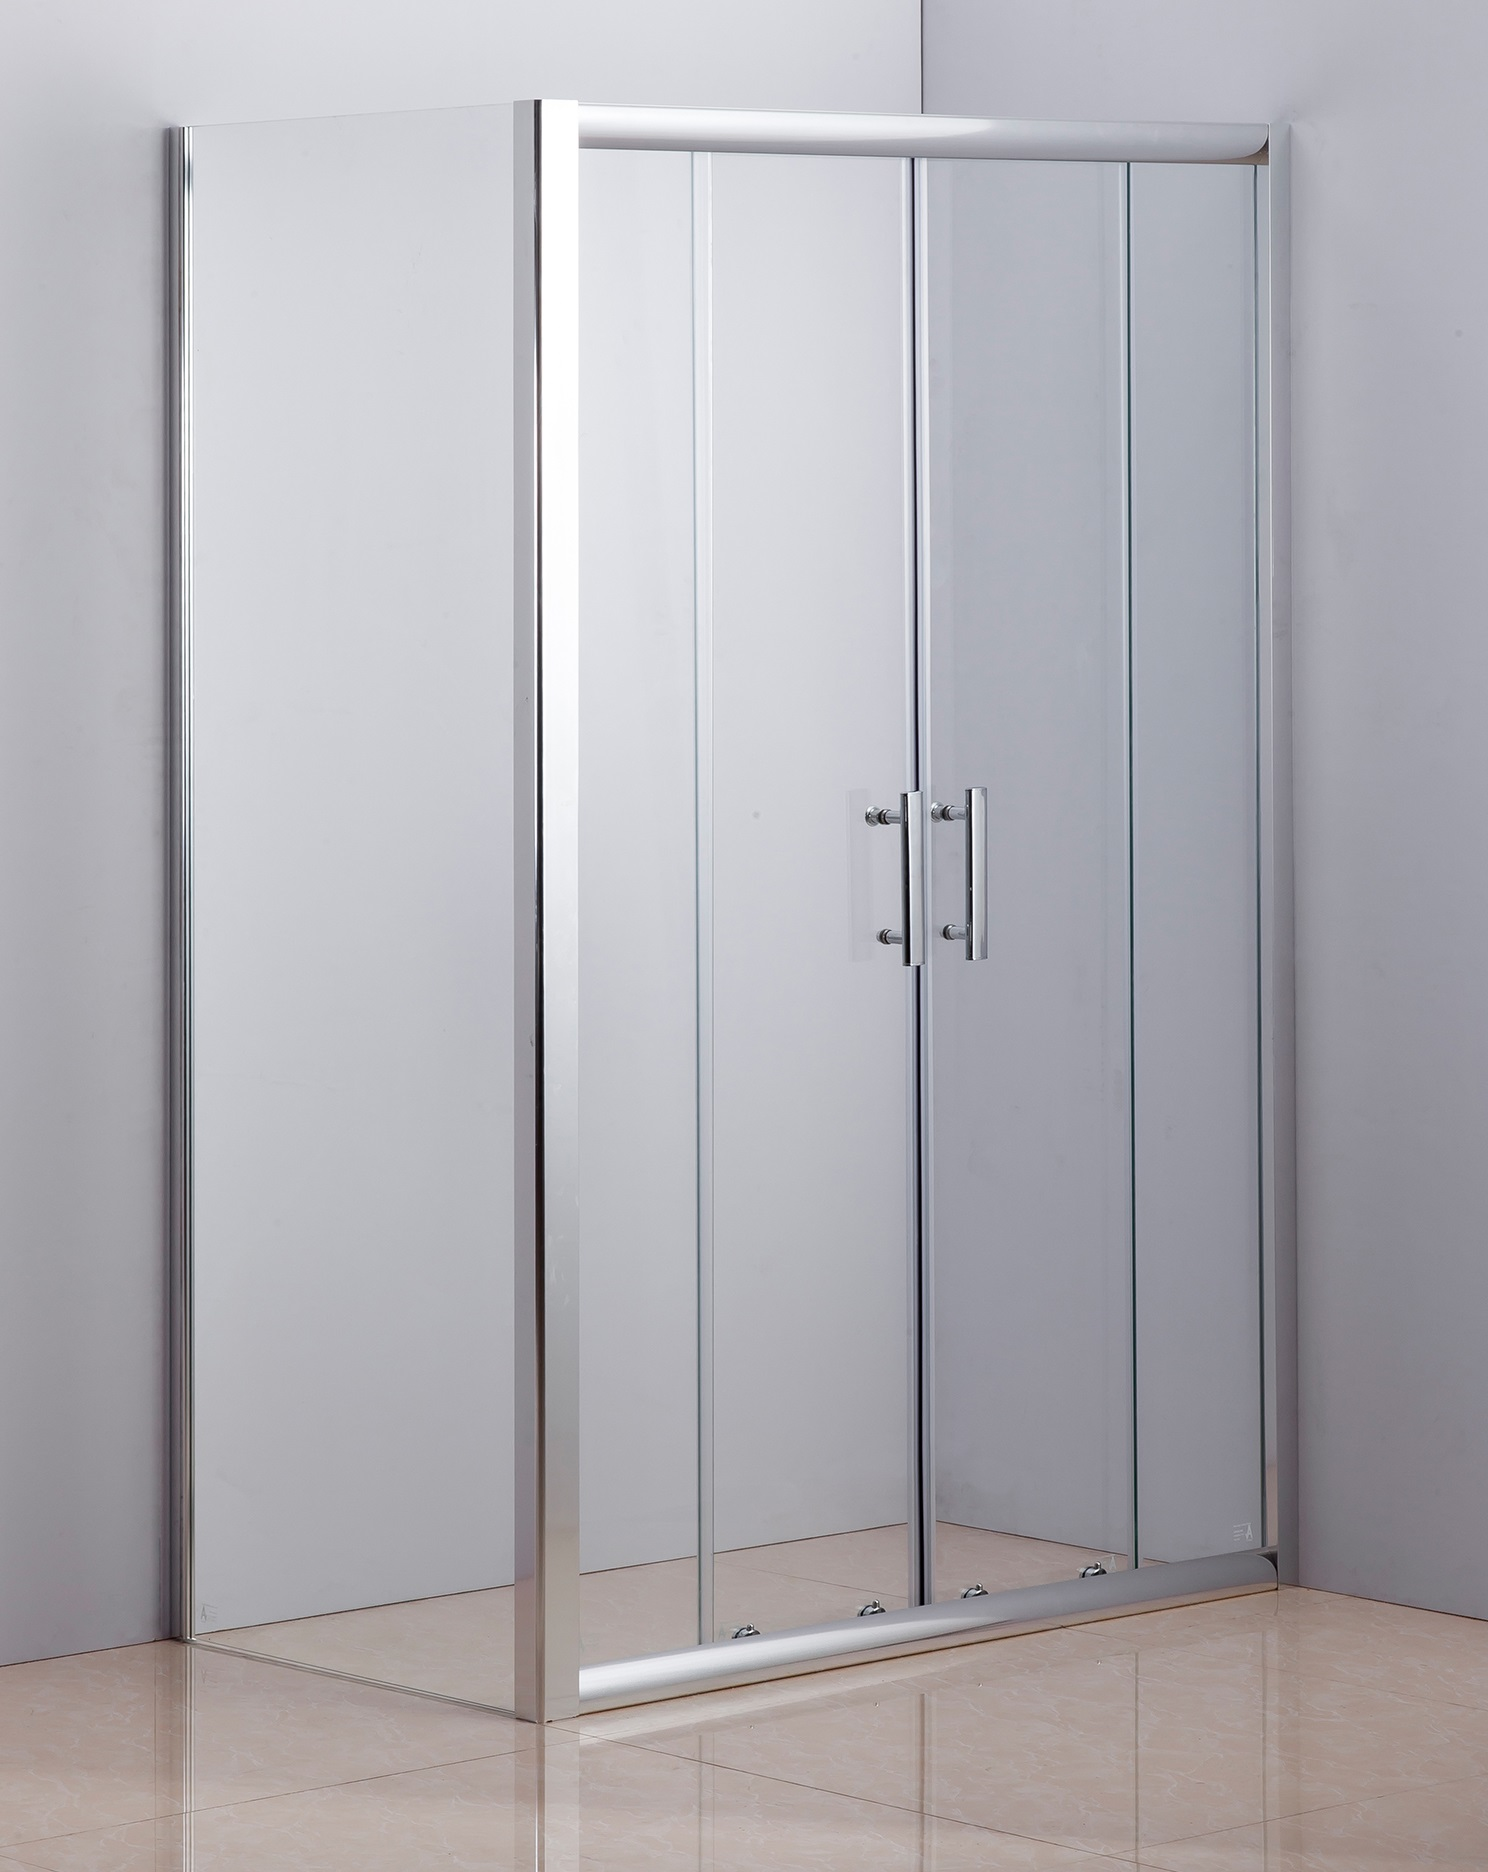 1200 X 700 Sliding Door Safety Glass Shower Screen By Della Francesca  Z2586